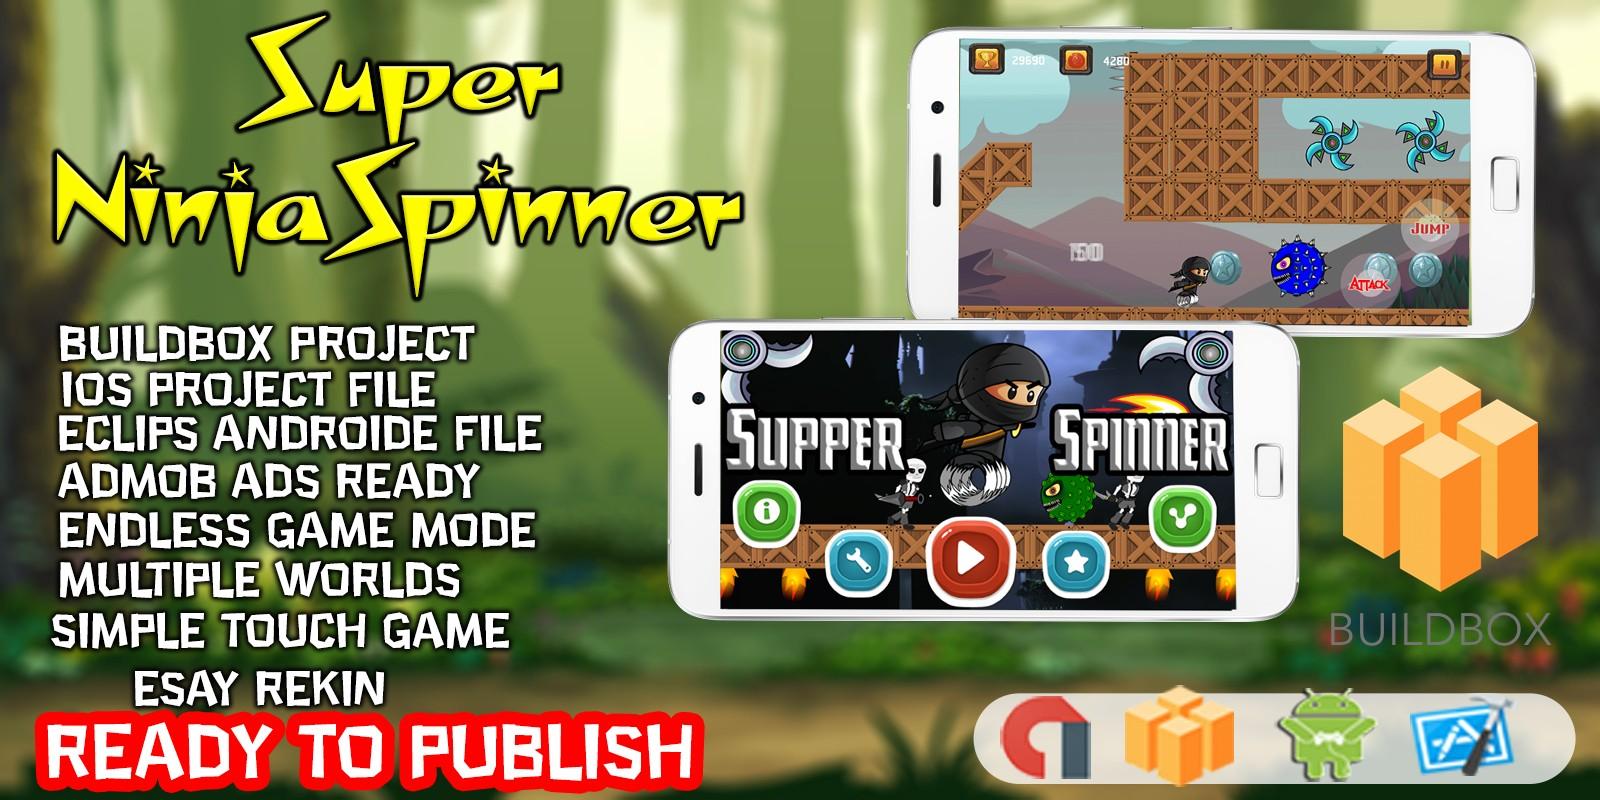 Super Ninja Spinner - Buildbox Template